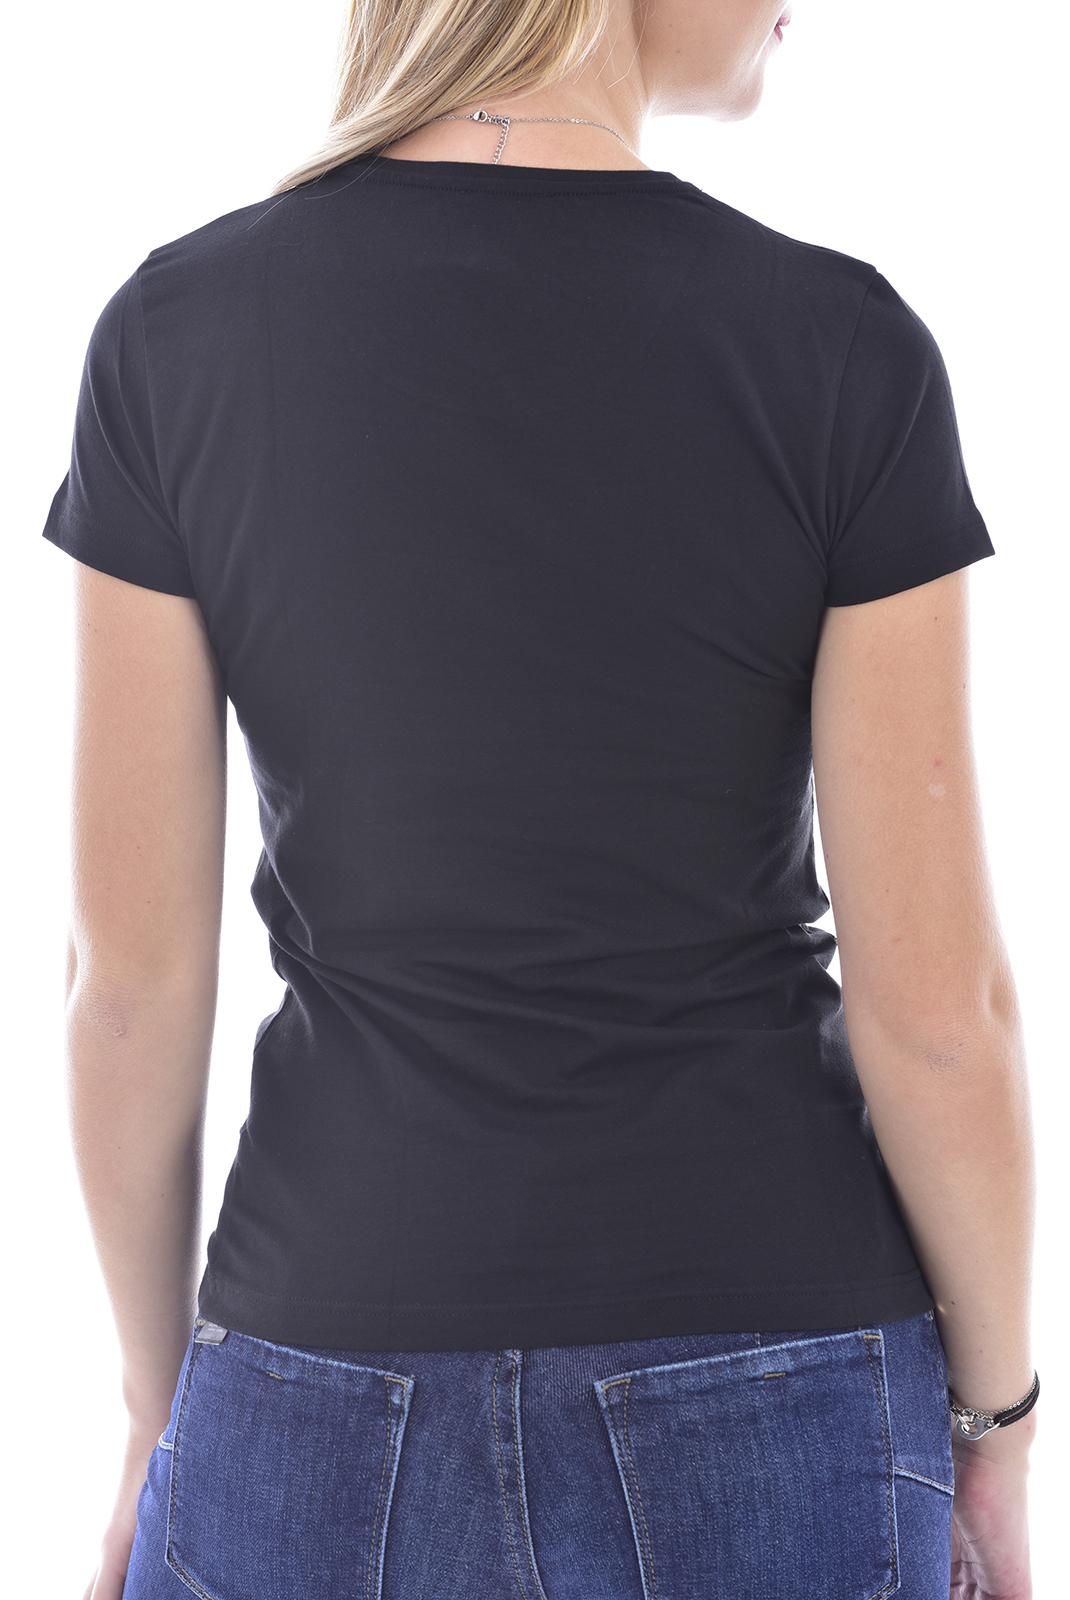 Tee shirt  Emporio armani 163139 0A263 020 BLACK